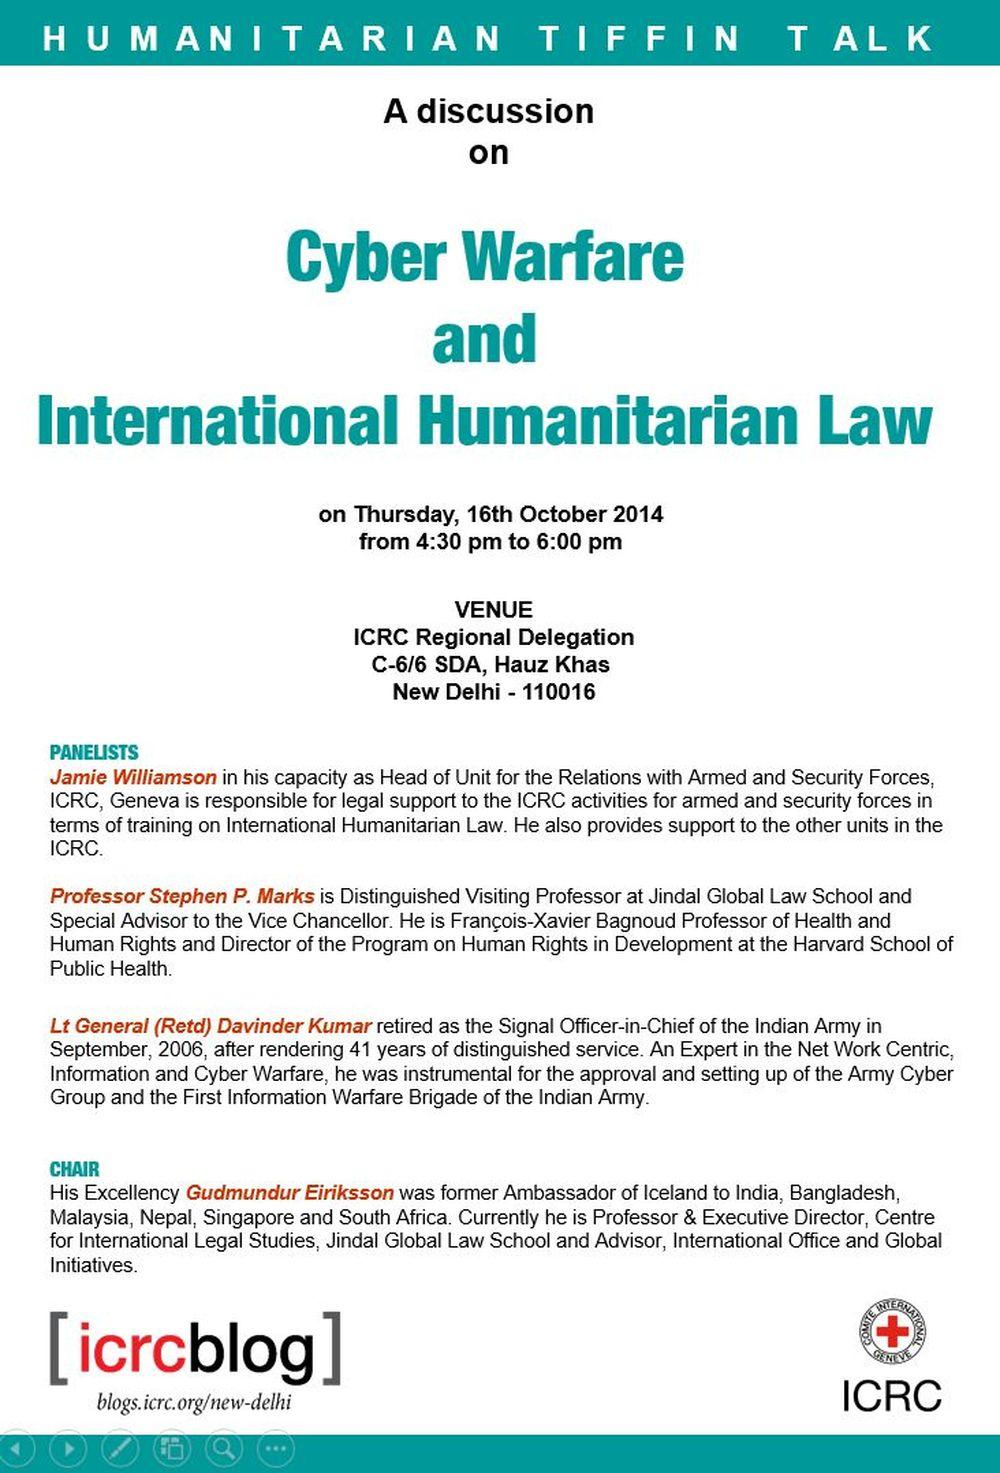 Humanitarian Tiffin Talk on 'Cyber Warfare and IHL' on 16